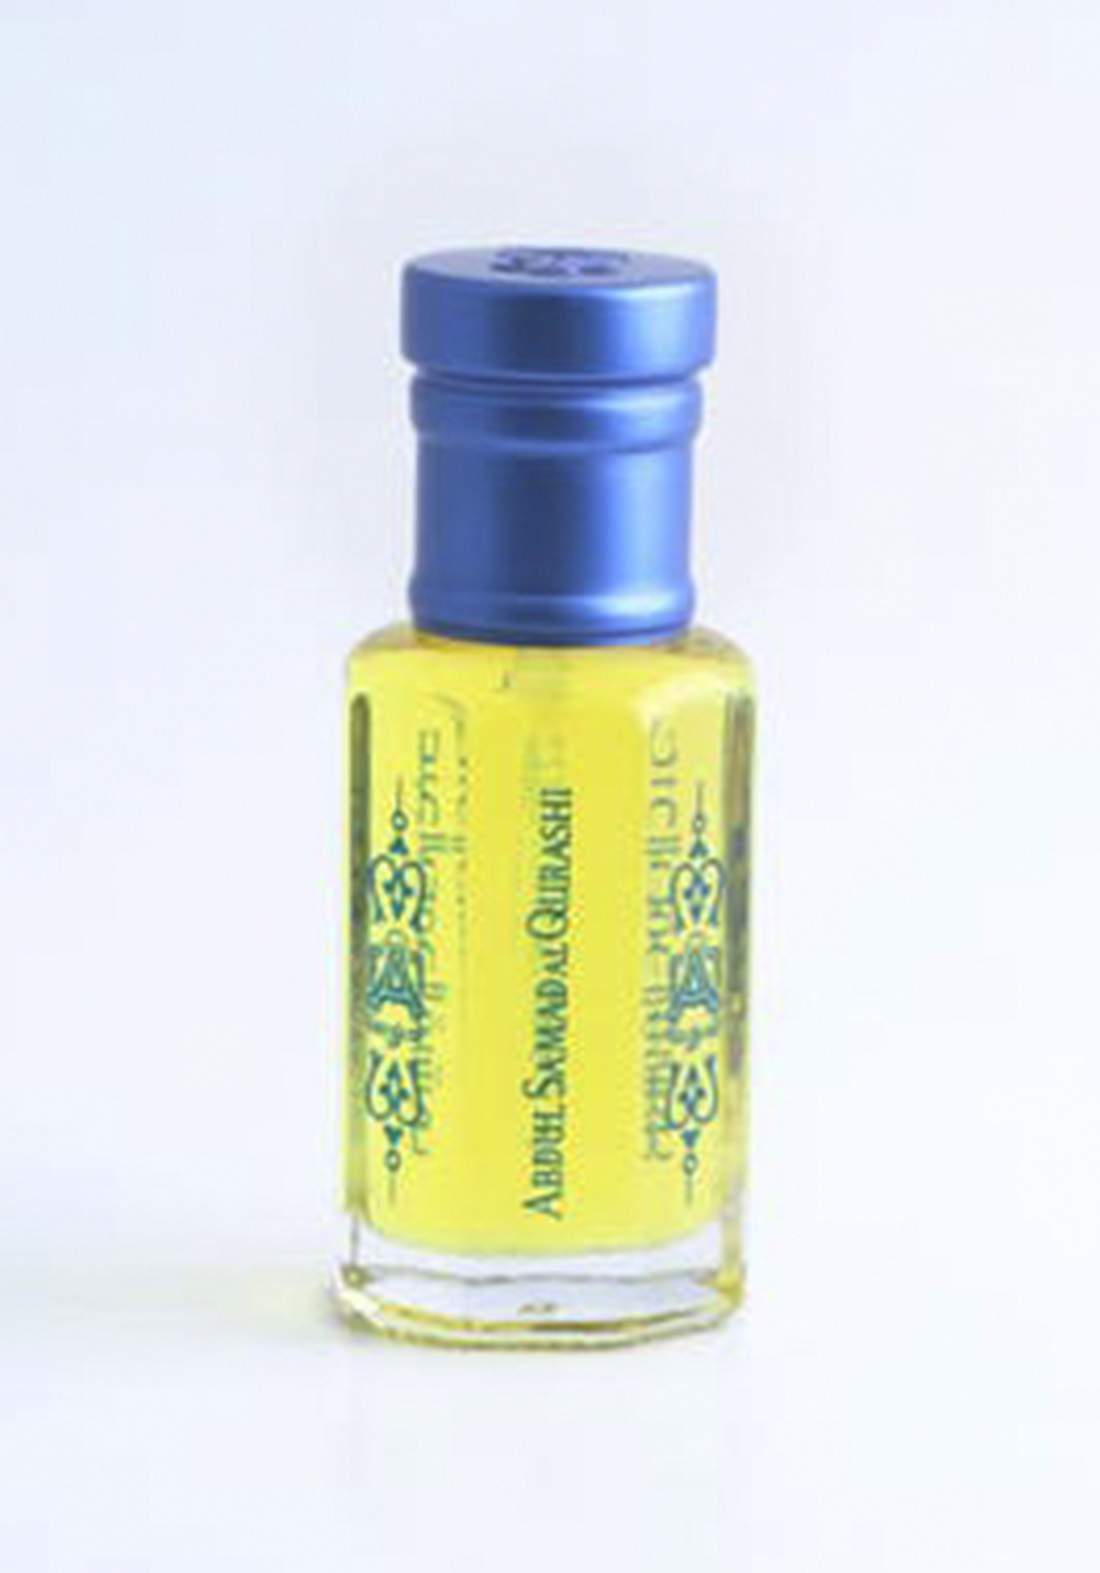 Abdul Samad Al Qurashi-41025  Phil Al Qurashi mix Perfume Oil 12g  عطر زيتي